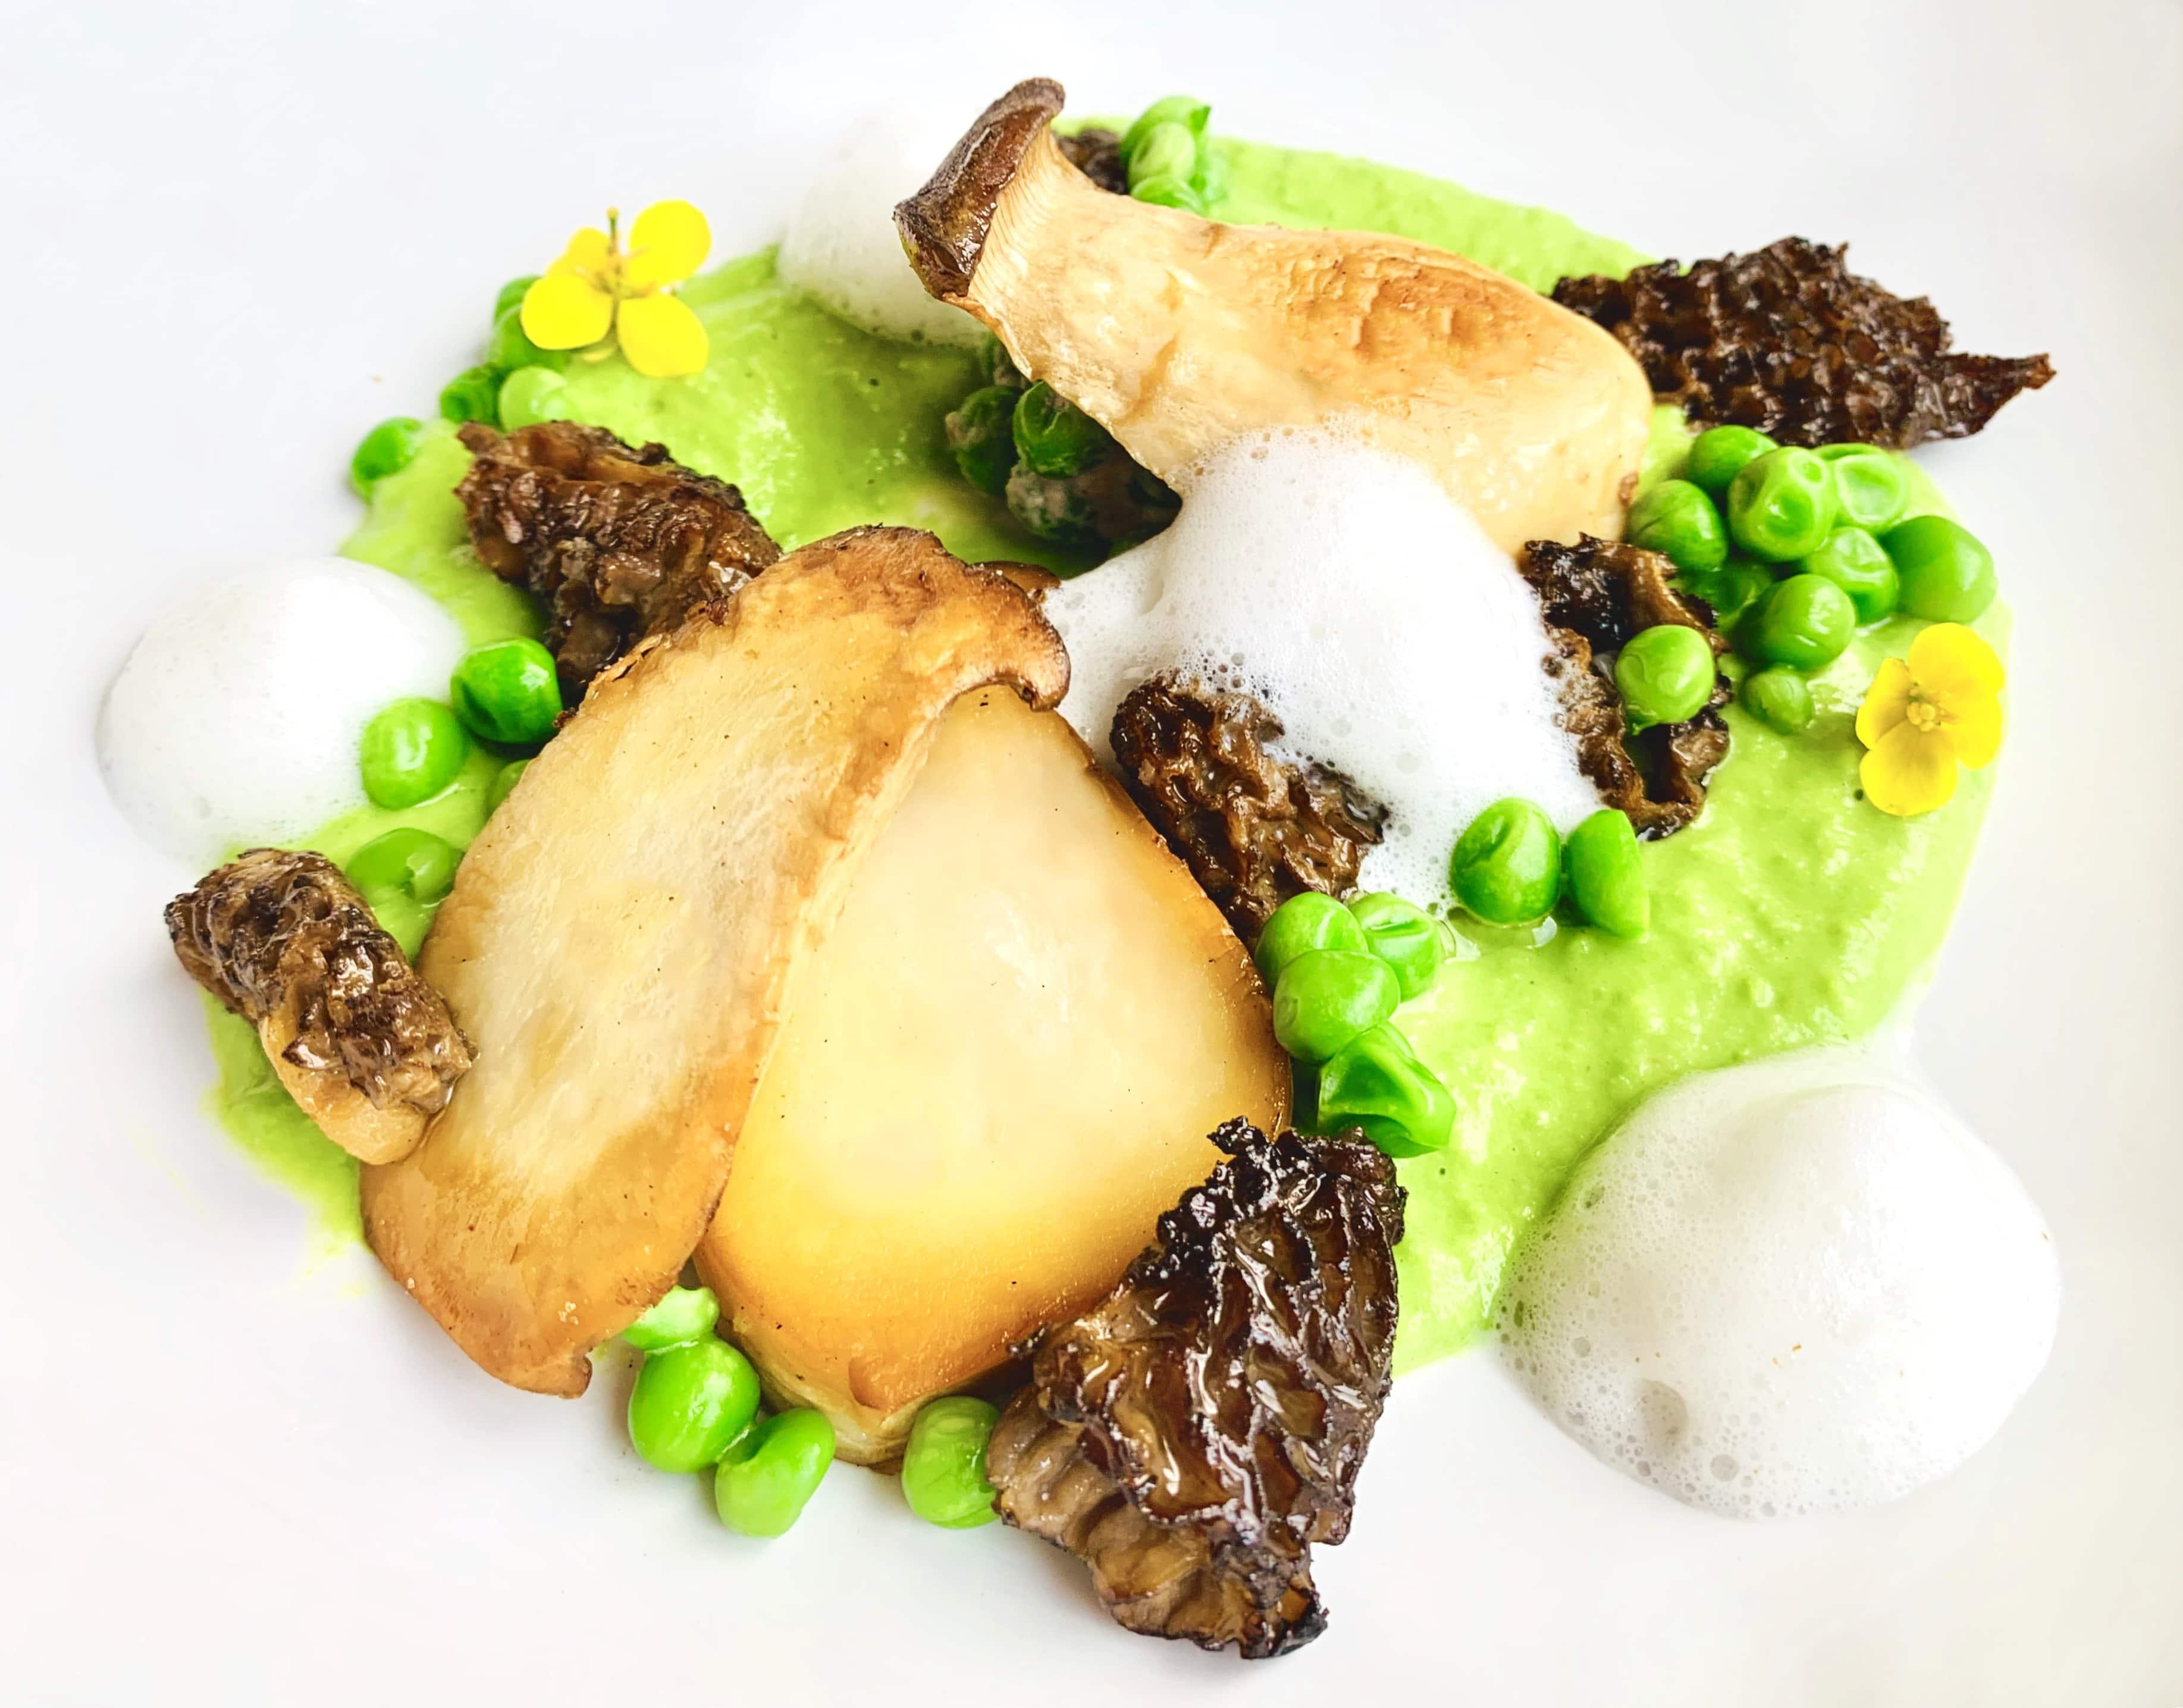 Dhingri Matar (Mushroom and Peas)